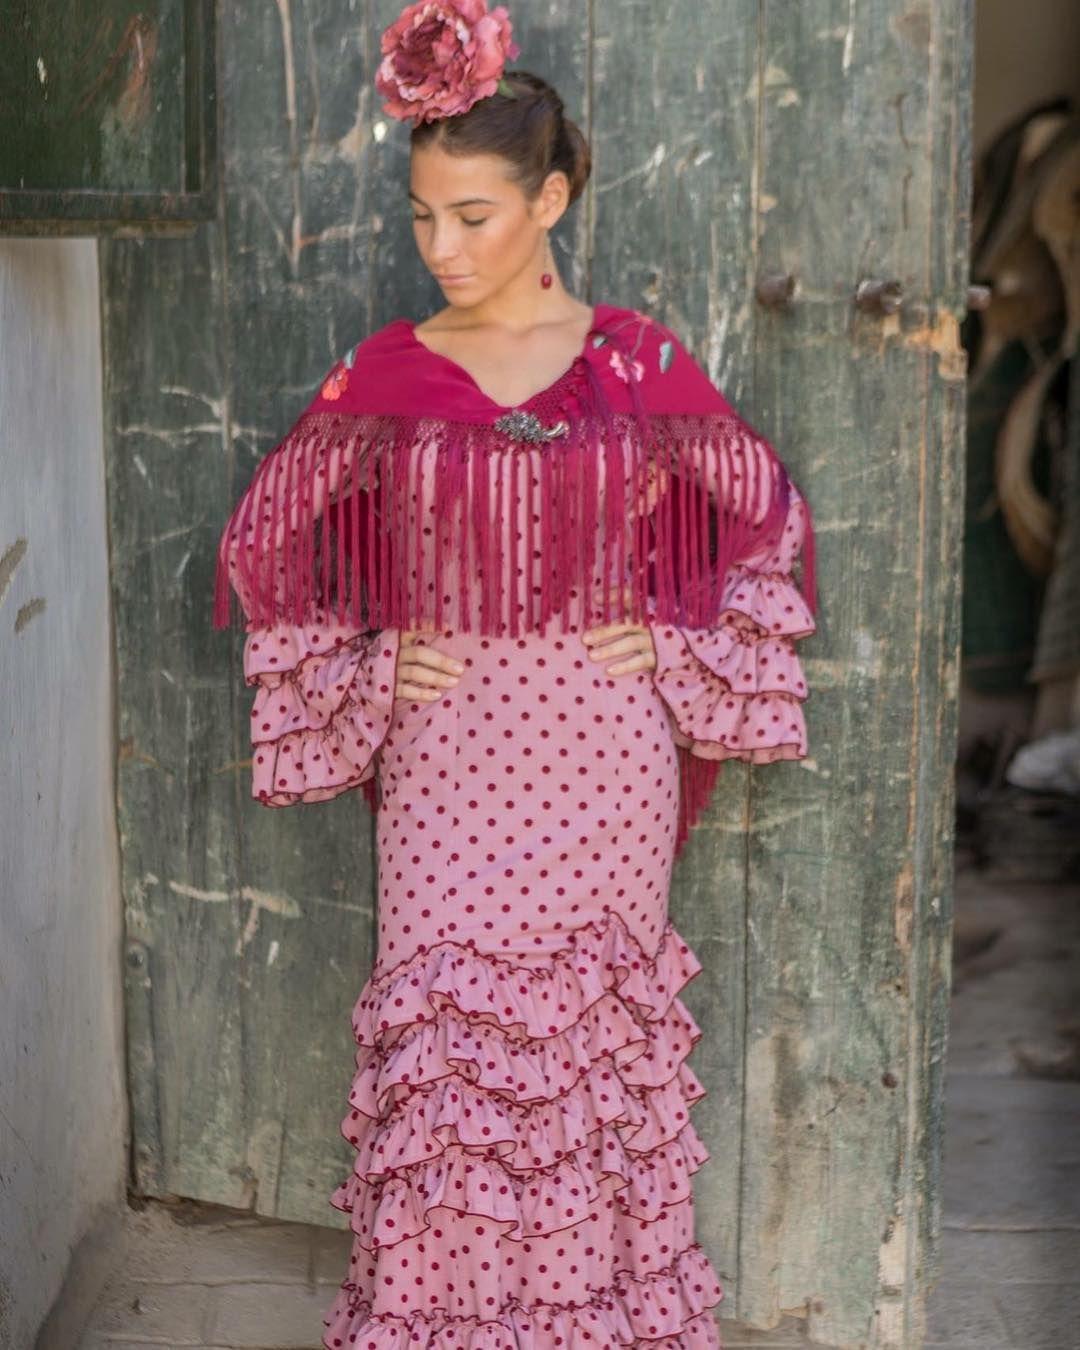 Buscas Traje De Flamenca Para Adolescente En Doña Ana Lo Tenemos Doñaana Doñaanamodafl Traje Flamenca Niña Vestido Flamenco Niña Vestidos De Flamenca